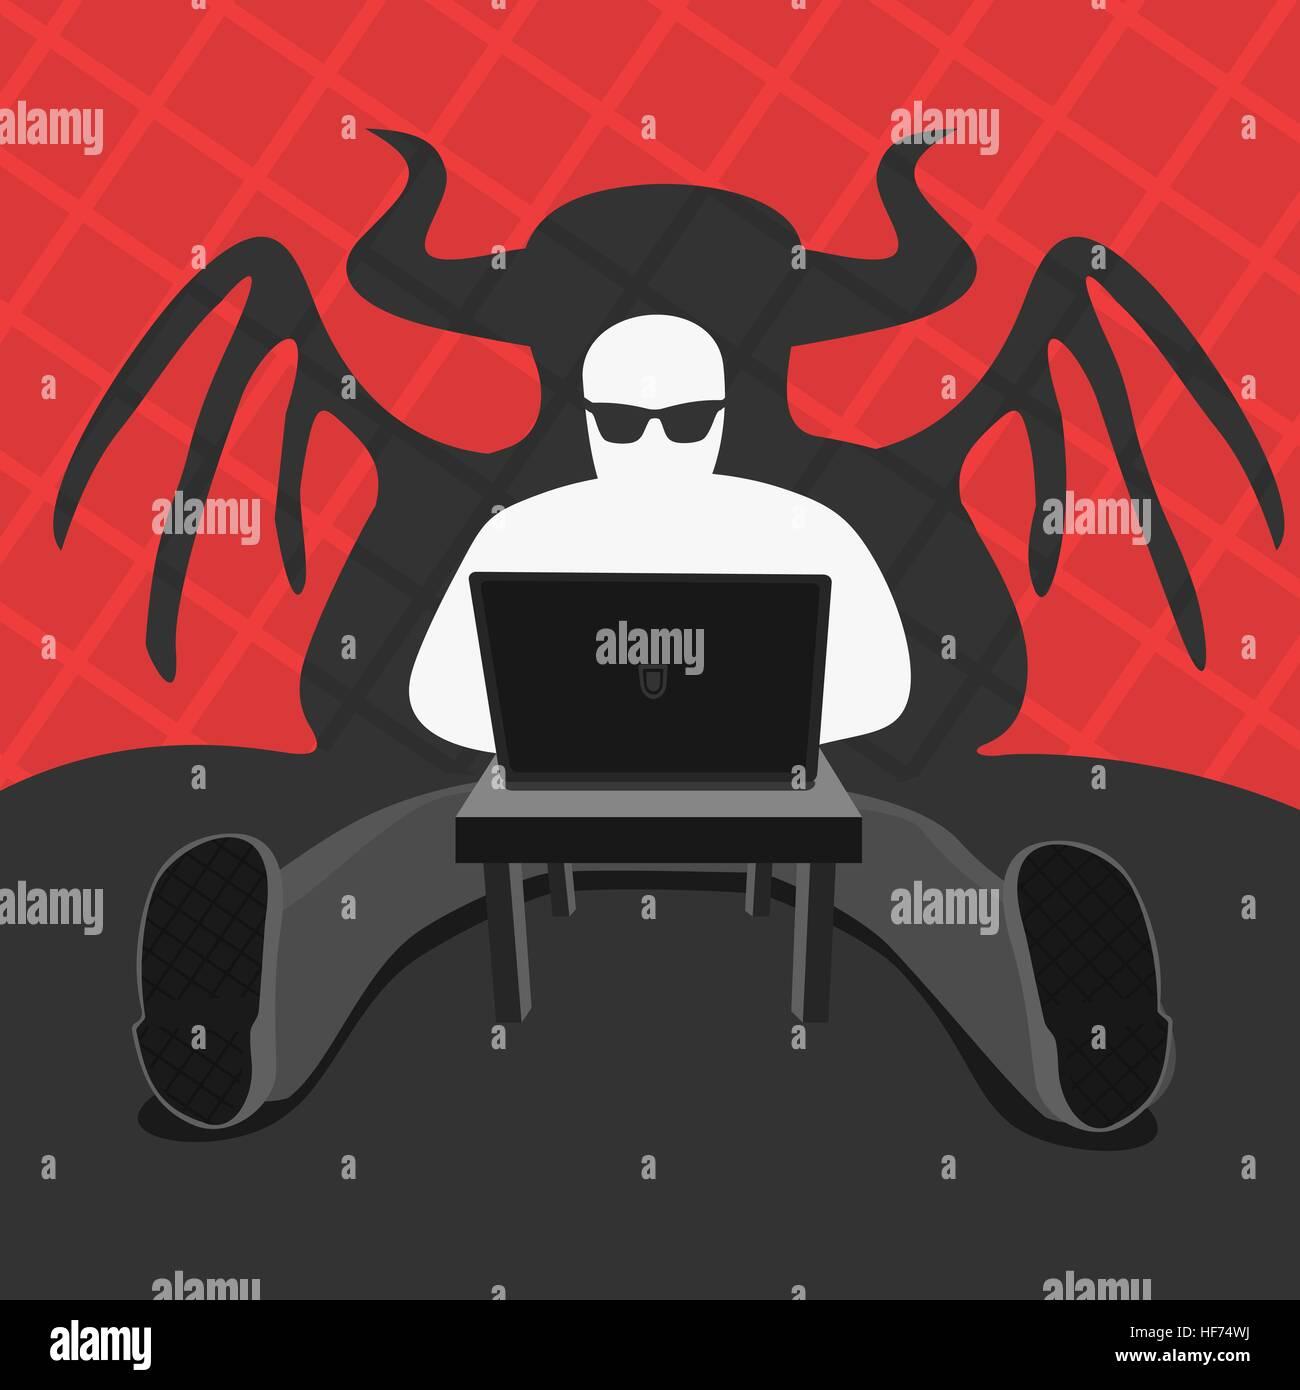 Hacker and Computer Devil Vector Illustration eps 8 file format - Stock Image